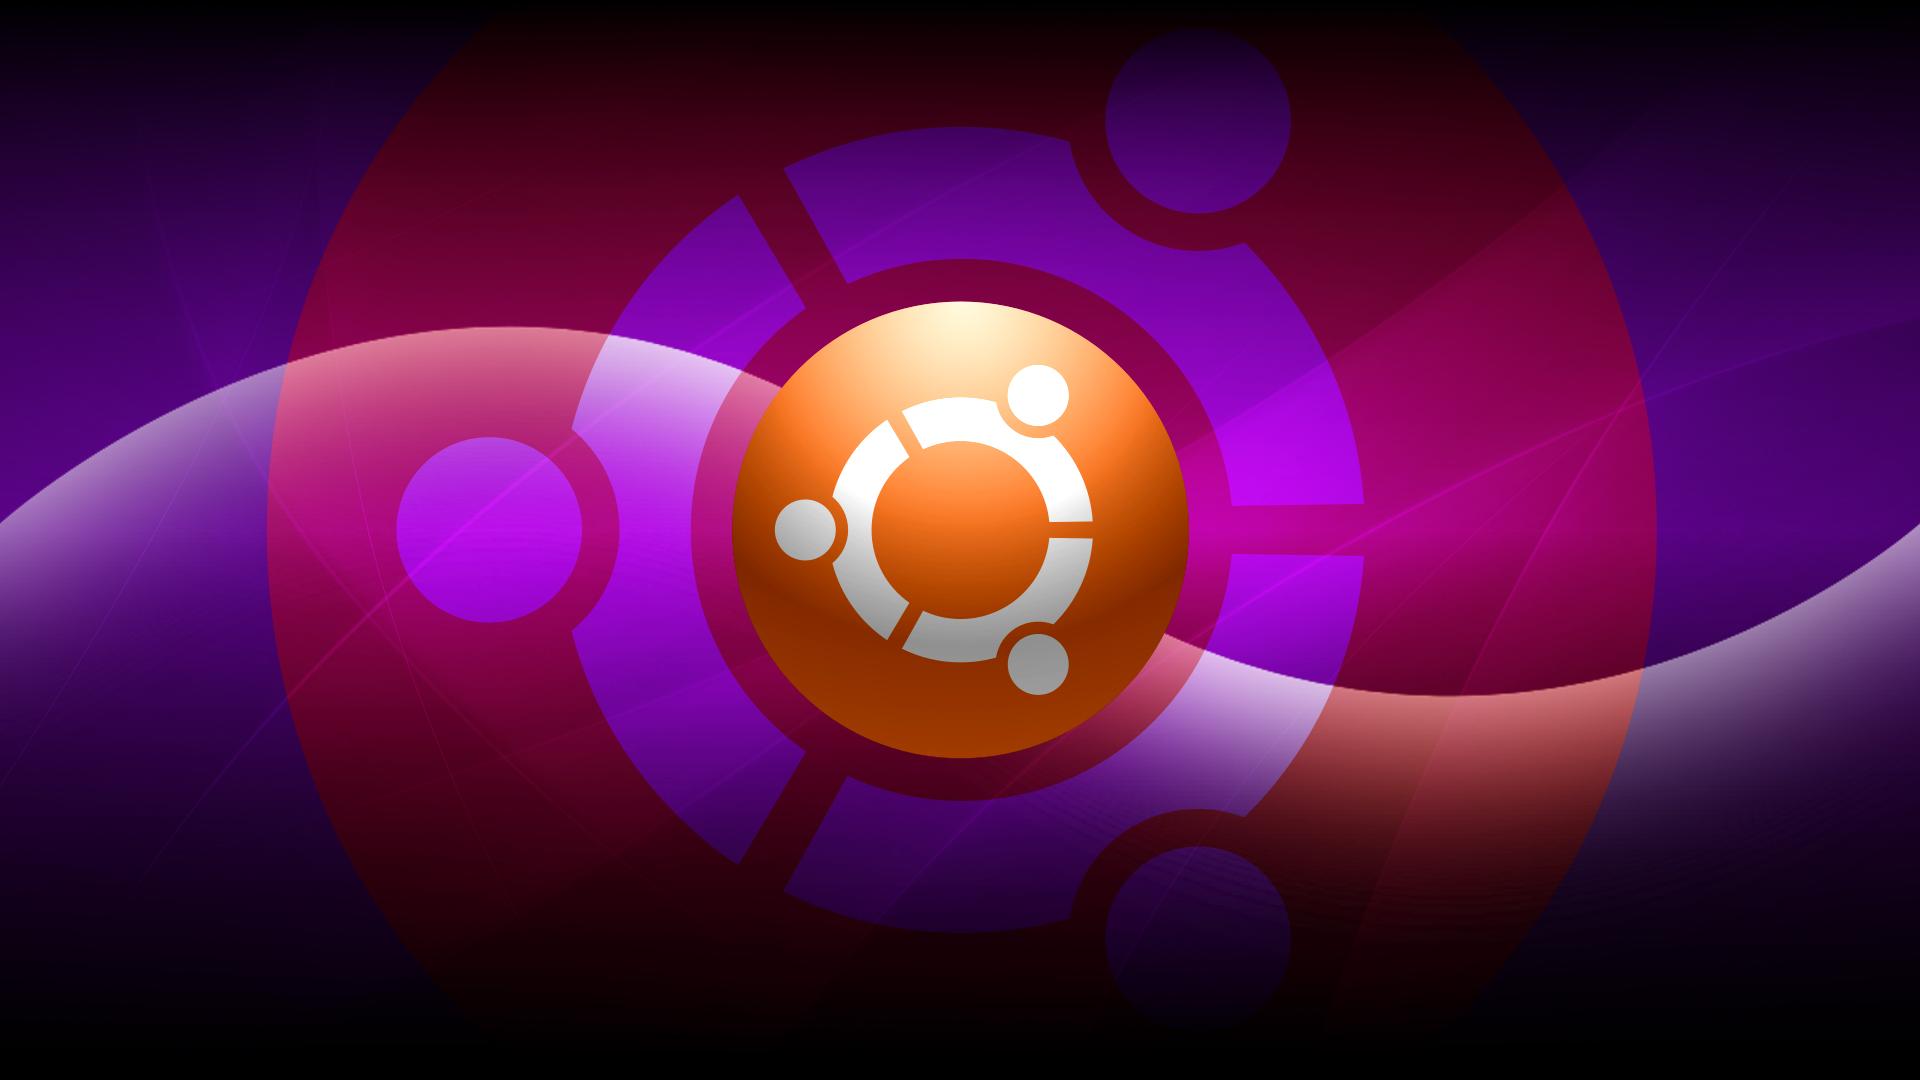 New Ubuntu Dark Wallpaper Set By Technokoopa On Deviantart